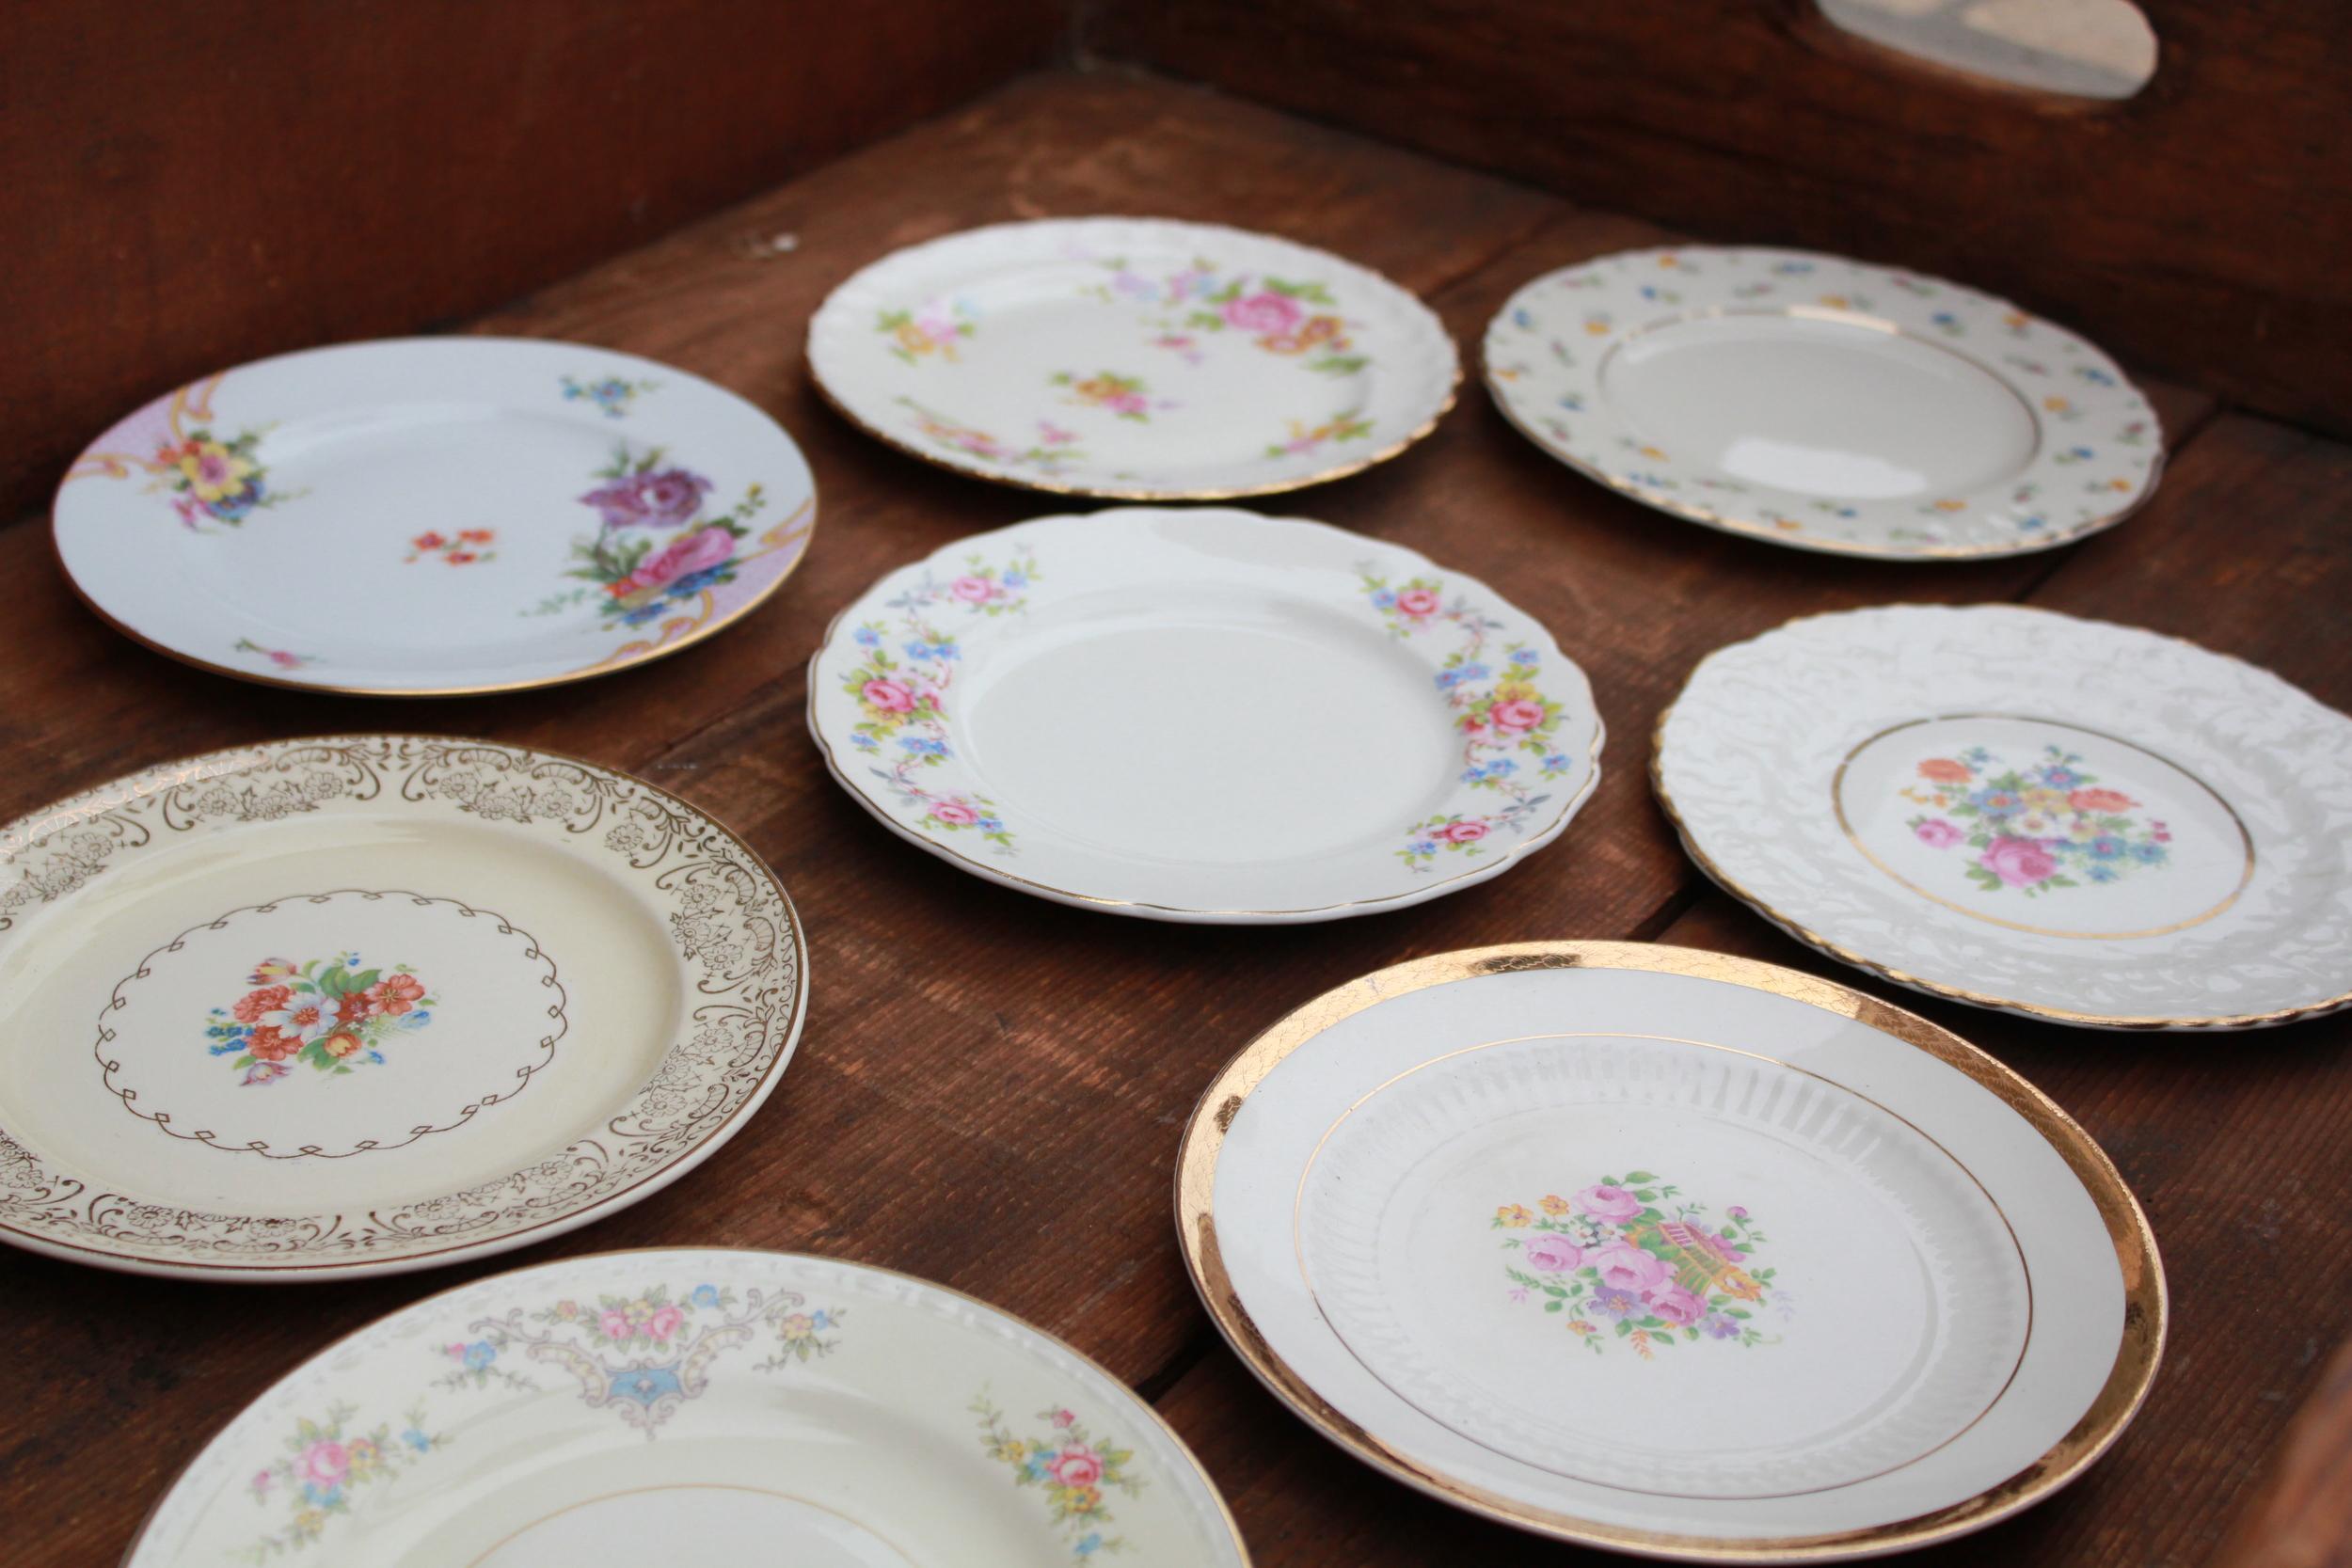 Golden Floral Collection Dessert Plates